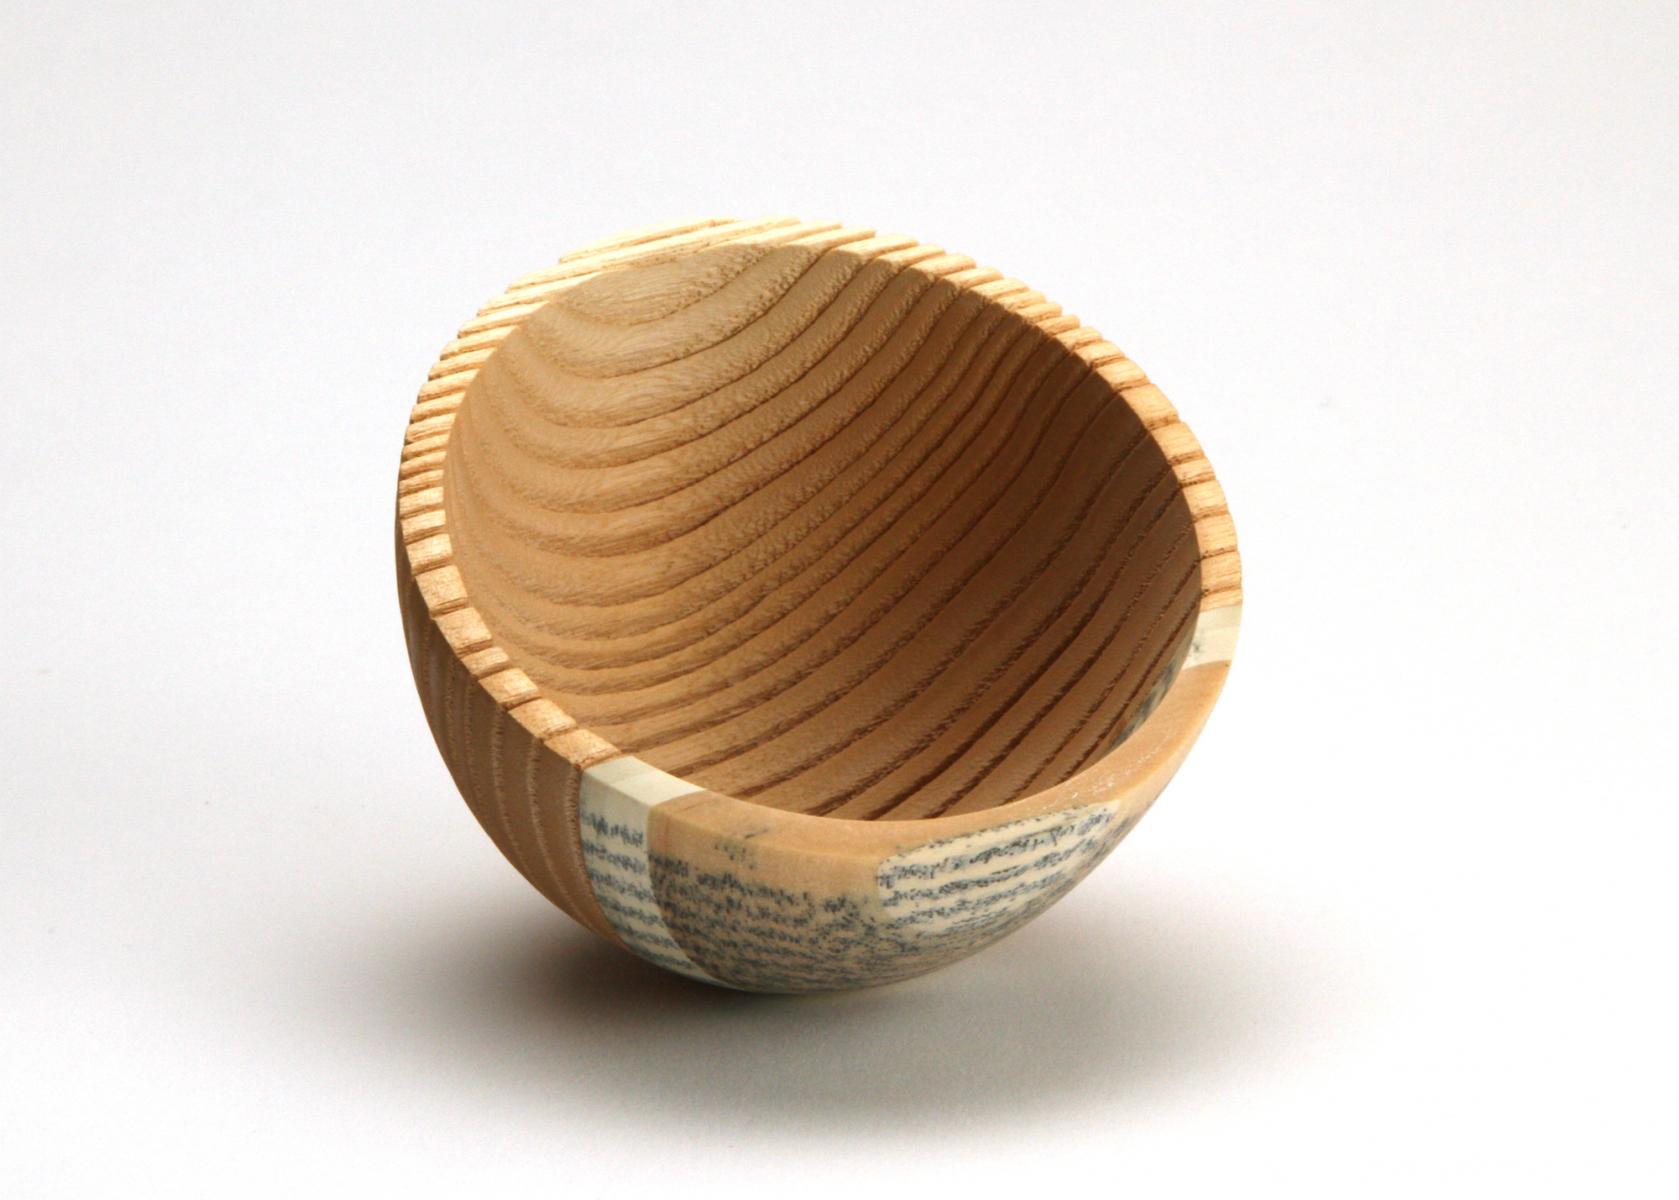 Bowl_4_1